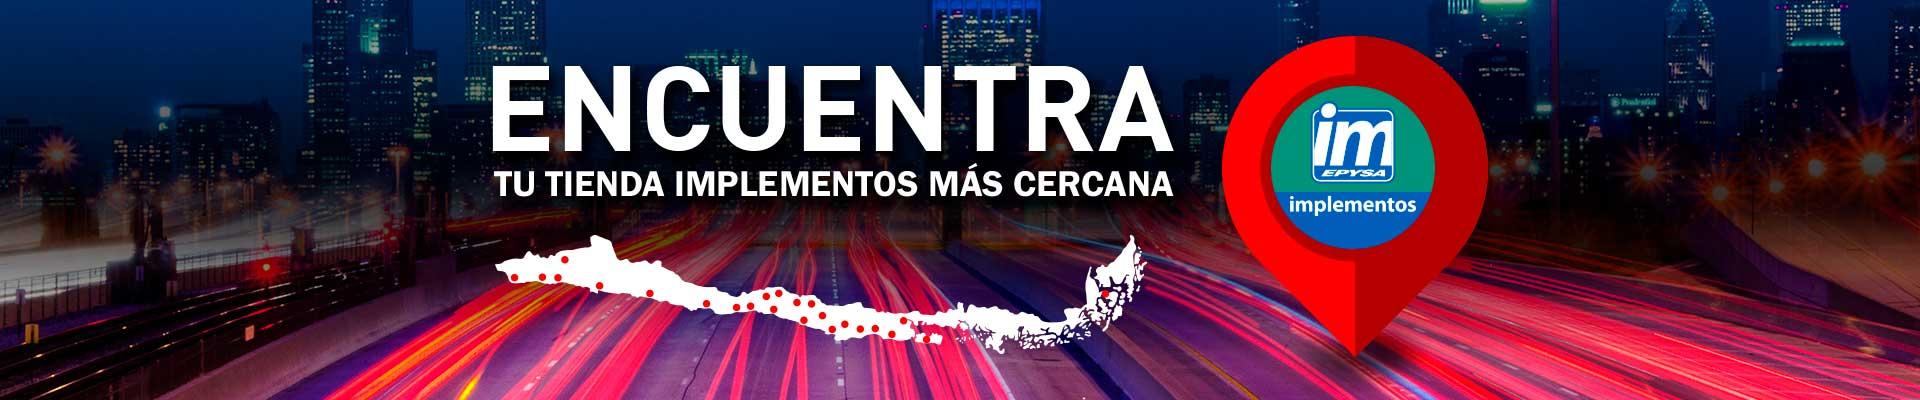 Mapa Tiendas Chile - Epysa Implementos S.A.